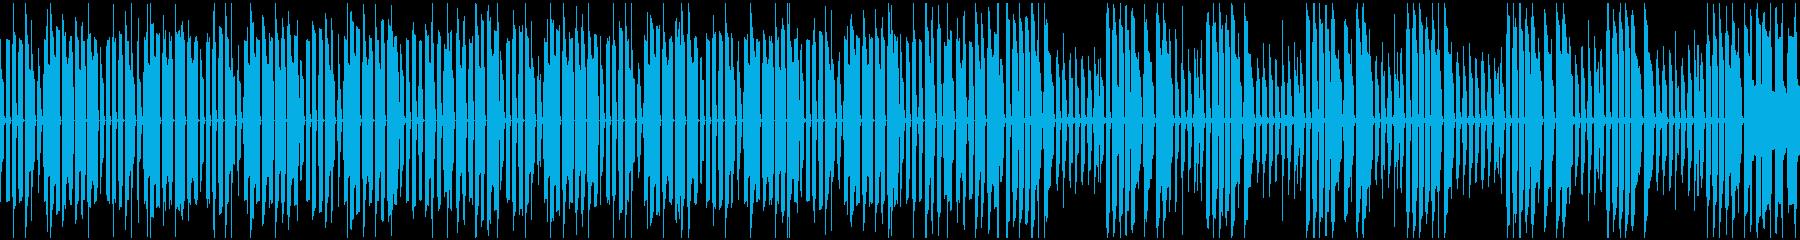 8bit風ループ音源です。の再生済みの波形